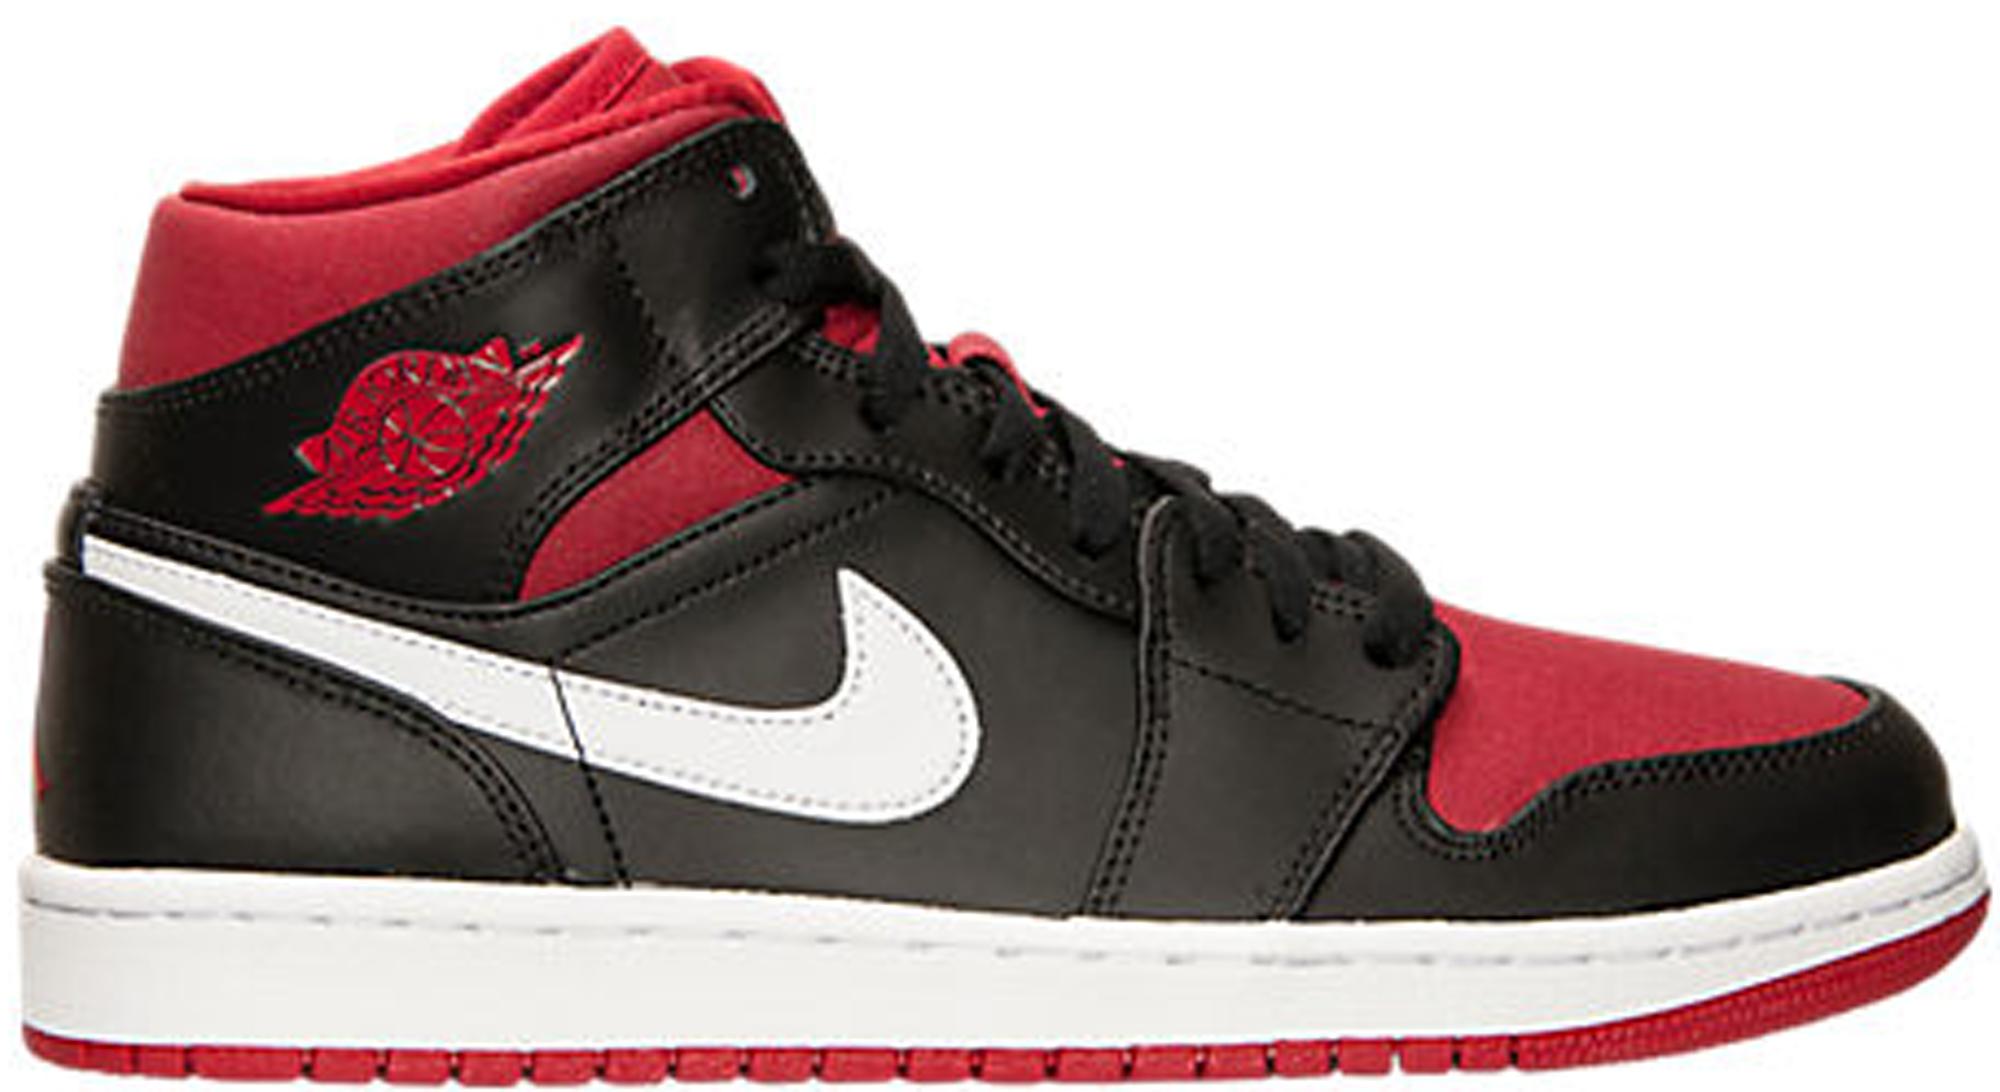 Jordan 1 Mid Black Gym Red White